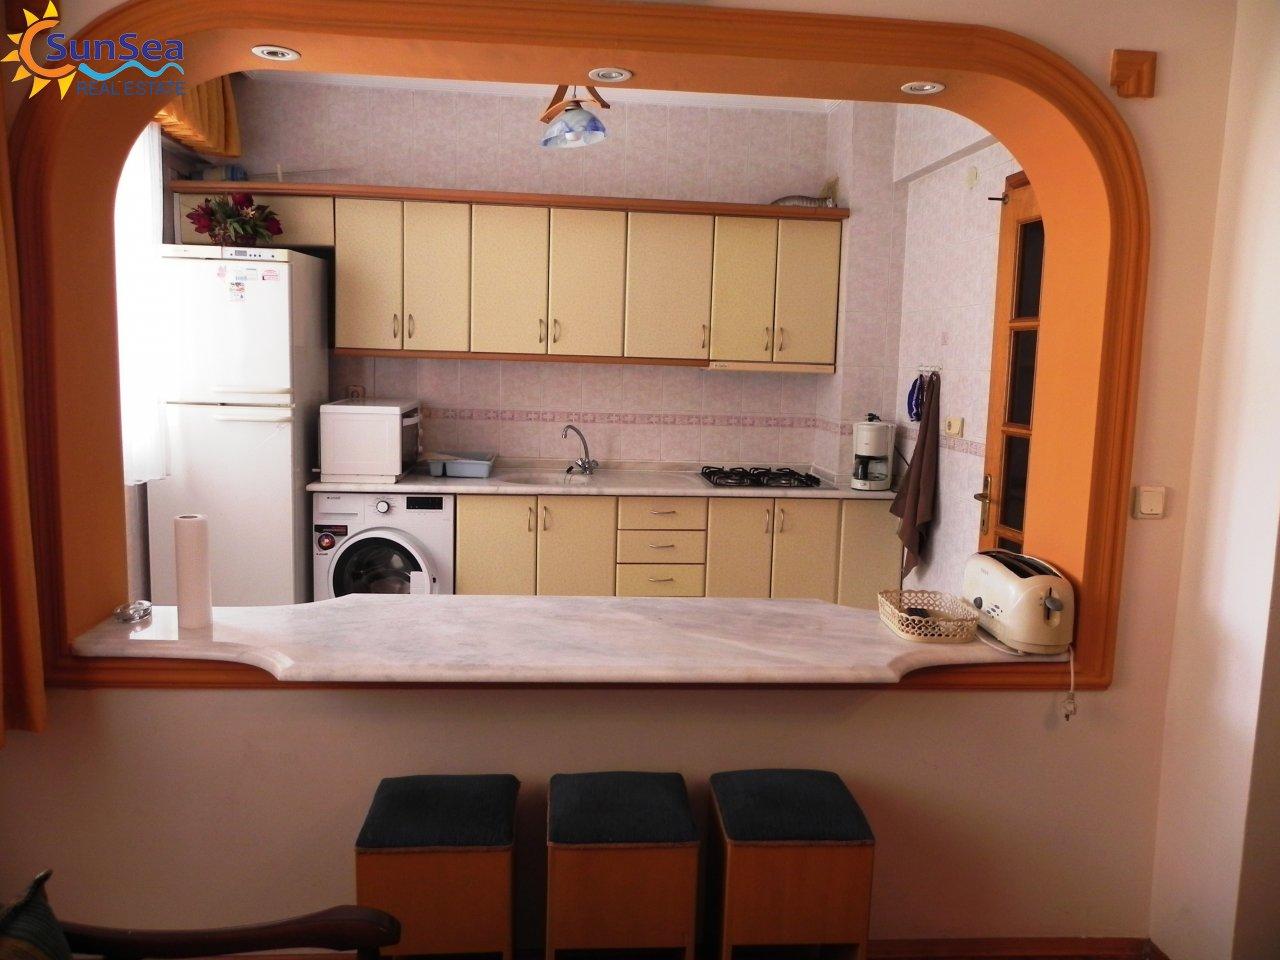 alanya safir site kitchen